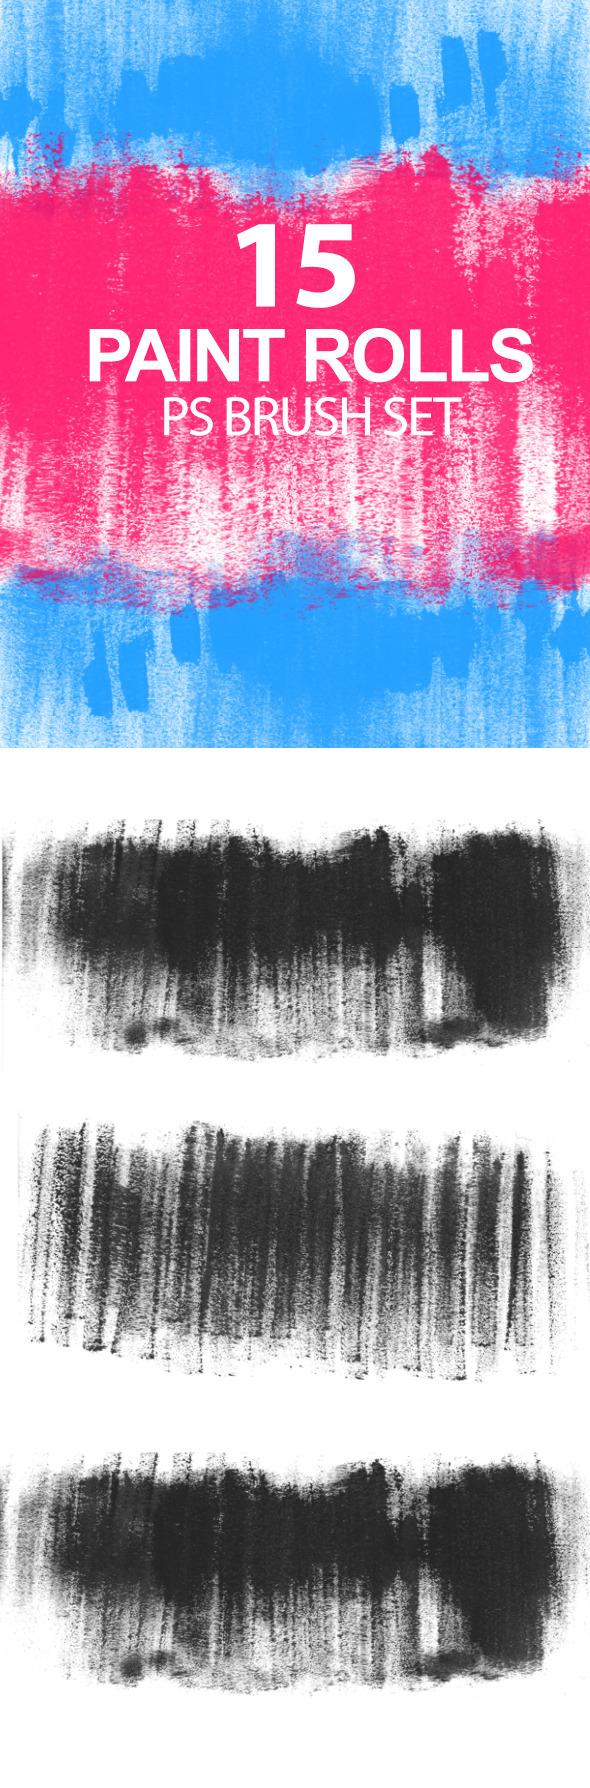 GraphicRiver Paint Rolls Photoshop Brush Set 6724034